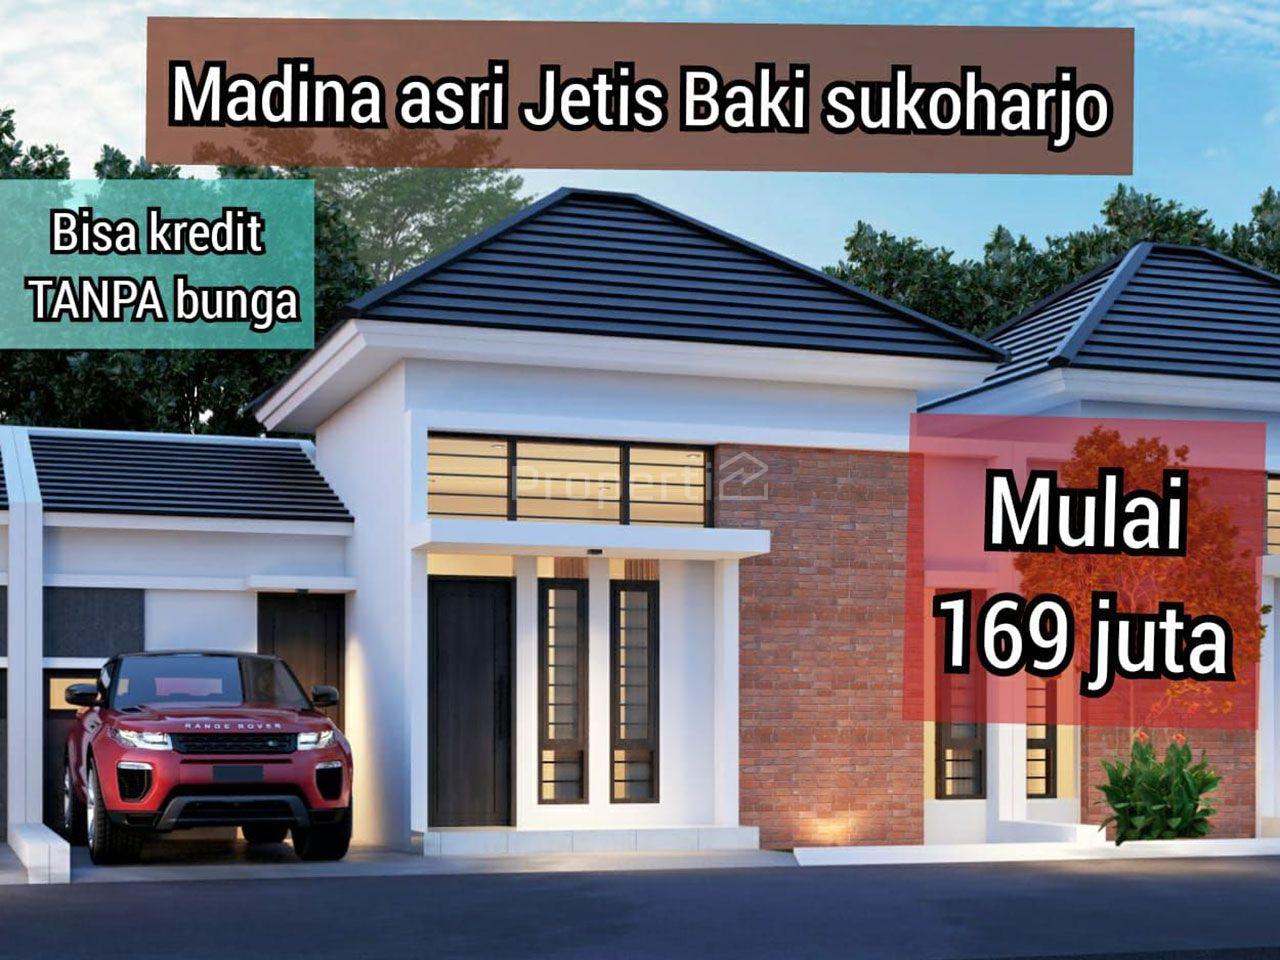 House Ready to Build in Madina Asri Jetis, Baki, Sukoharjo, Jawa Tengah